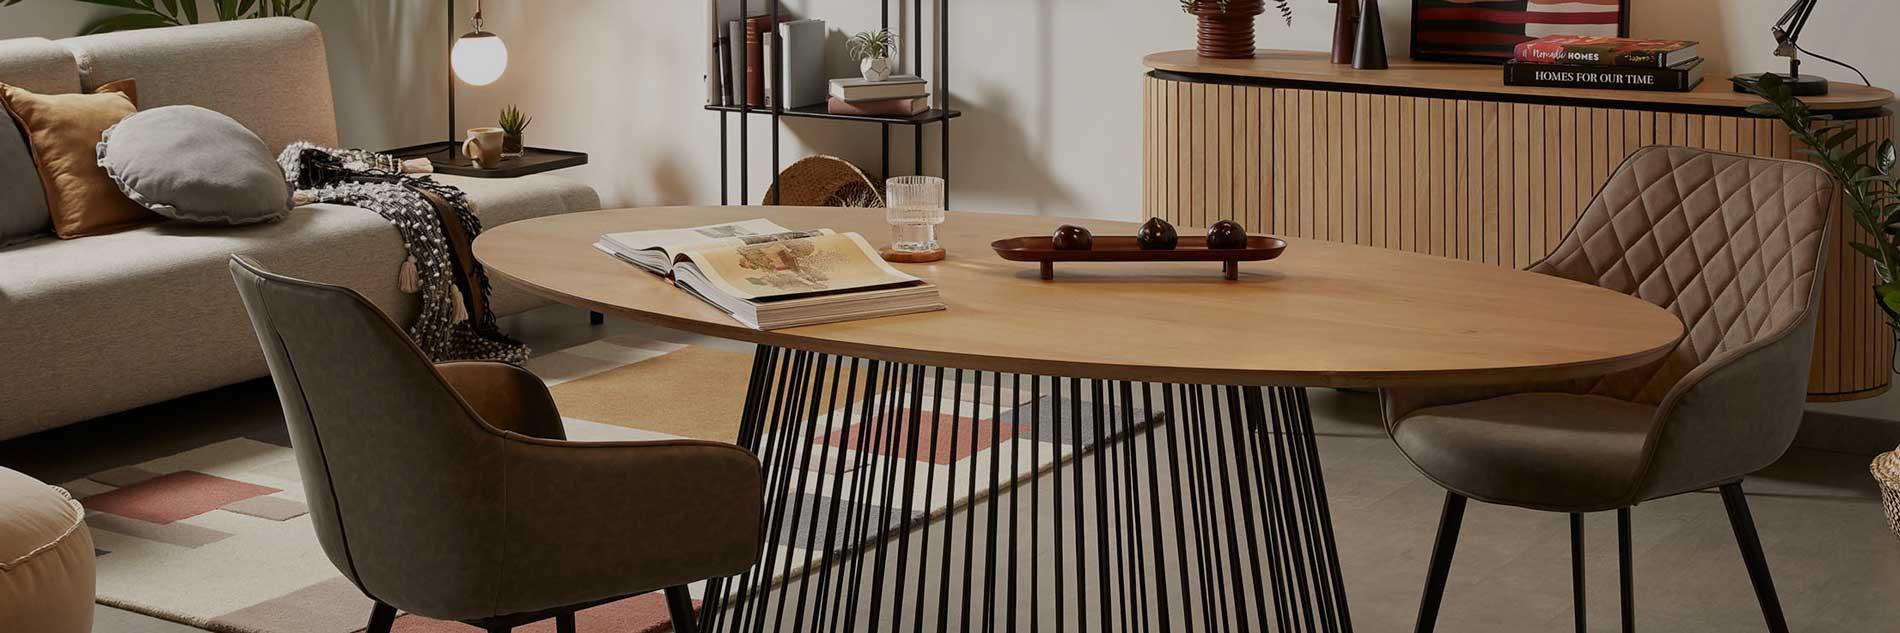 muebles-comedor-kavehome.jpg